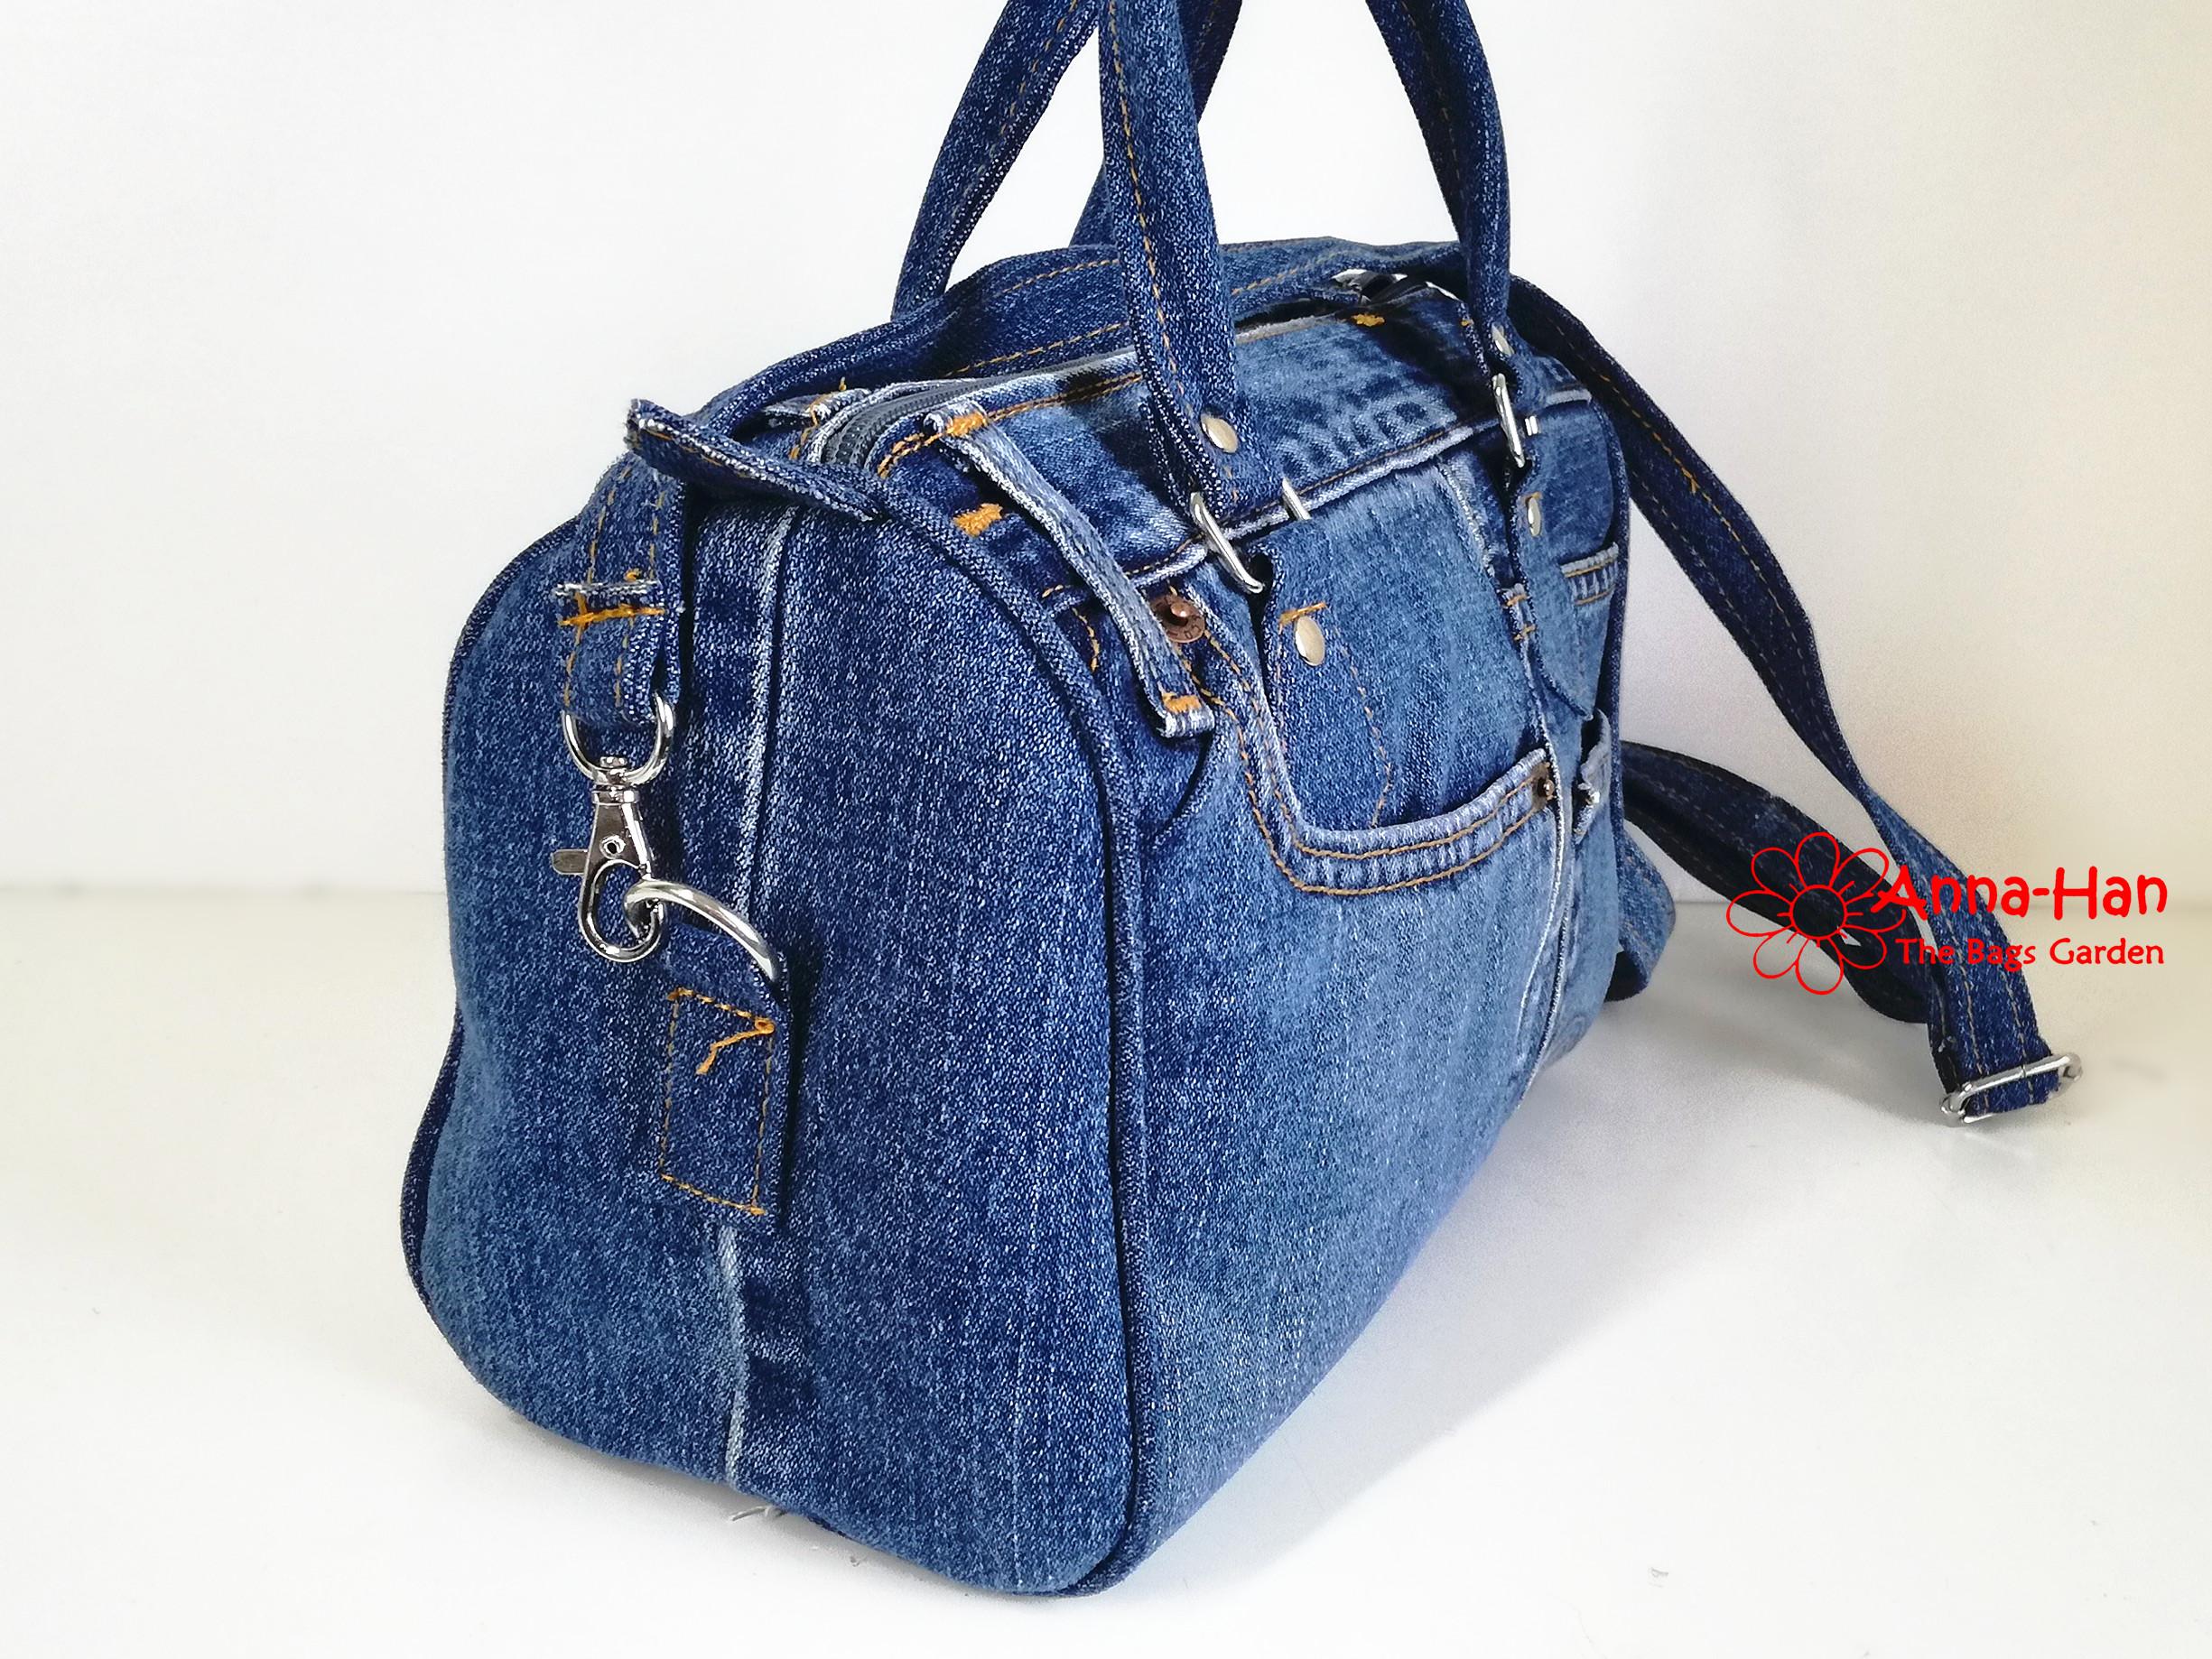 Jb05 Ellipse Jean Handmade Bag The Bags Garden